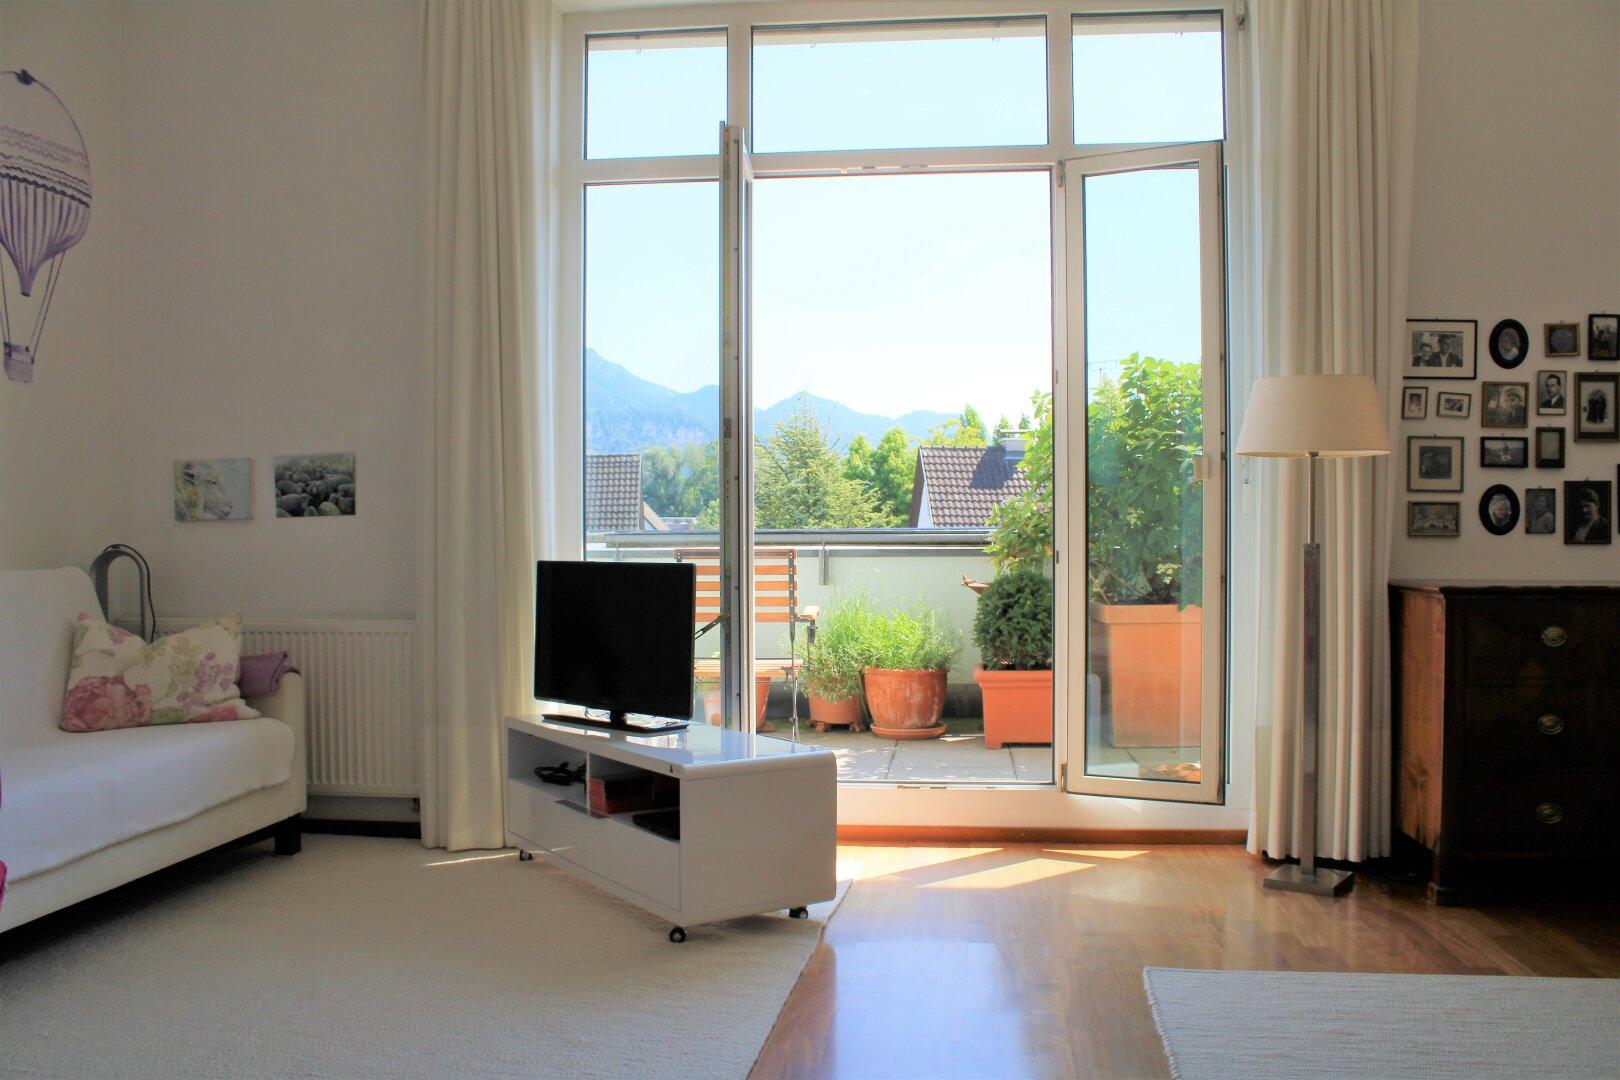 Bodentiefe Fenster - Doppelverglasung